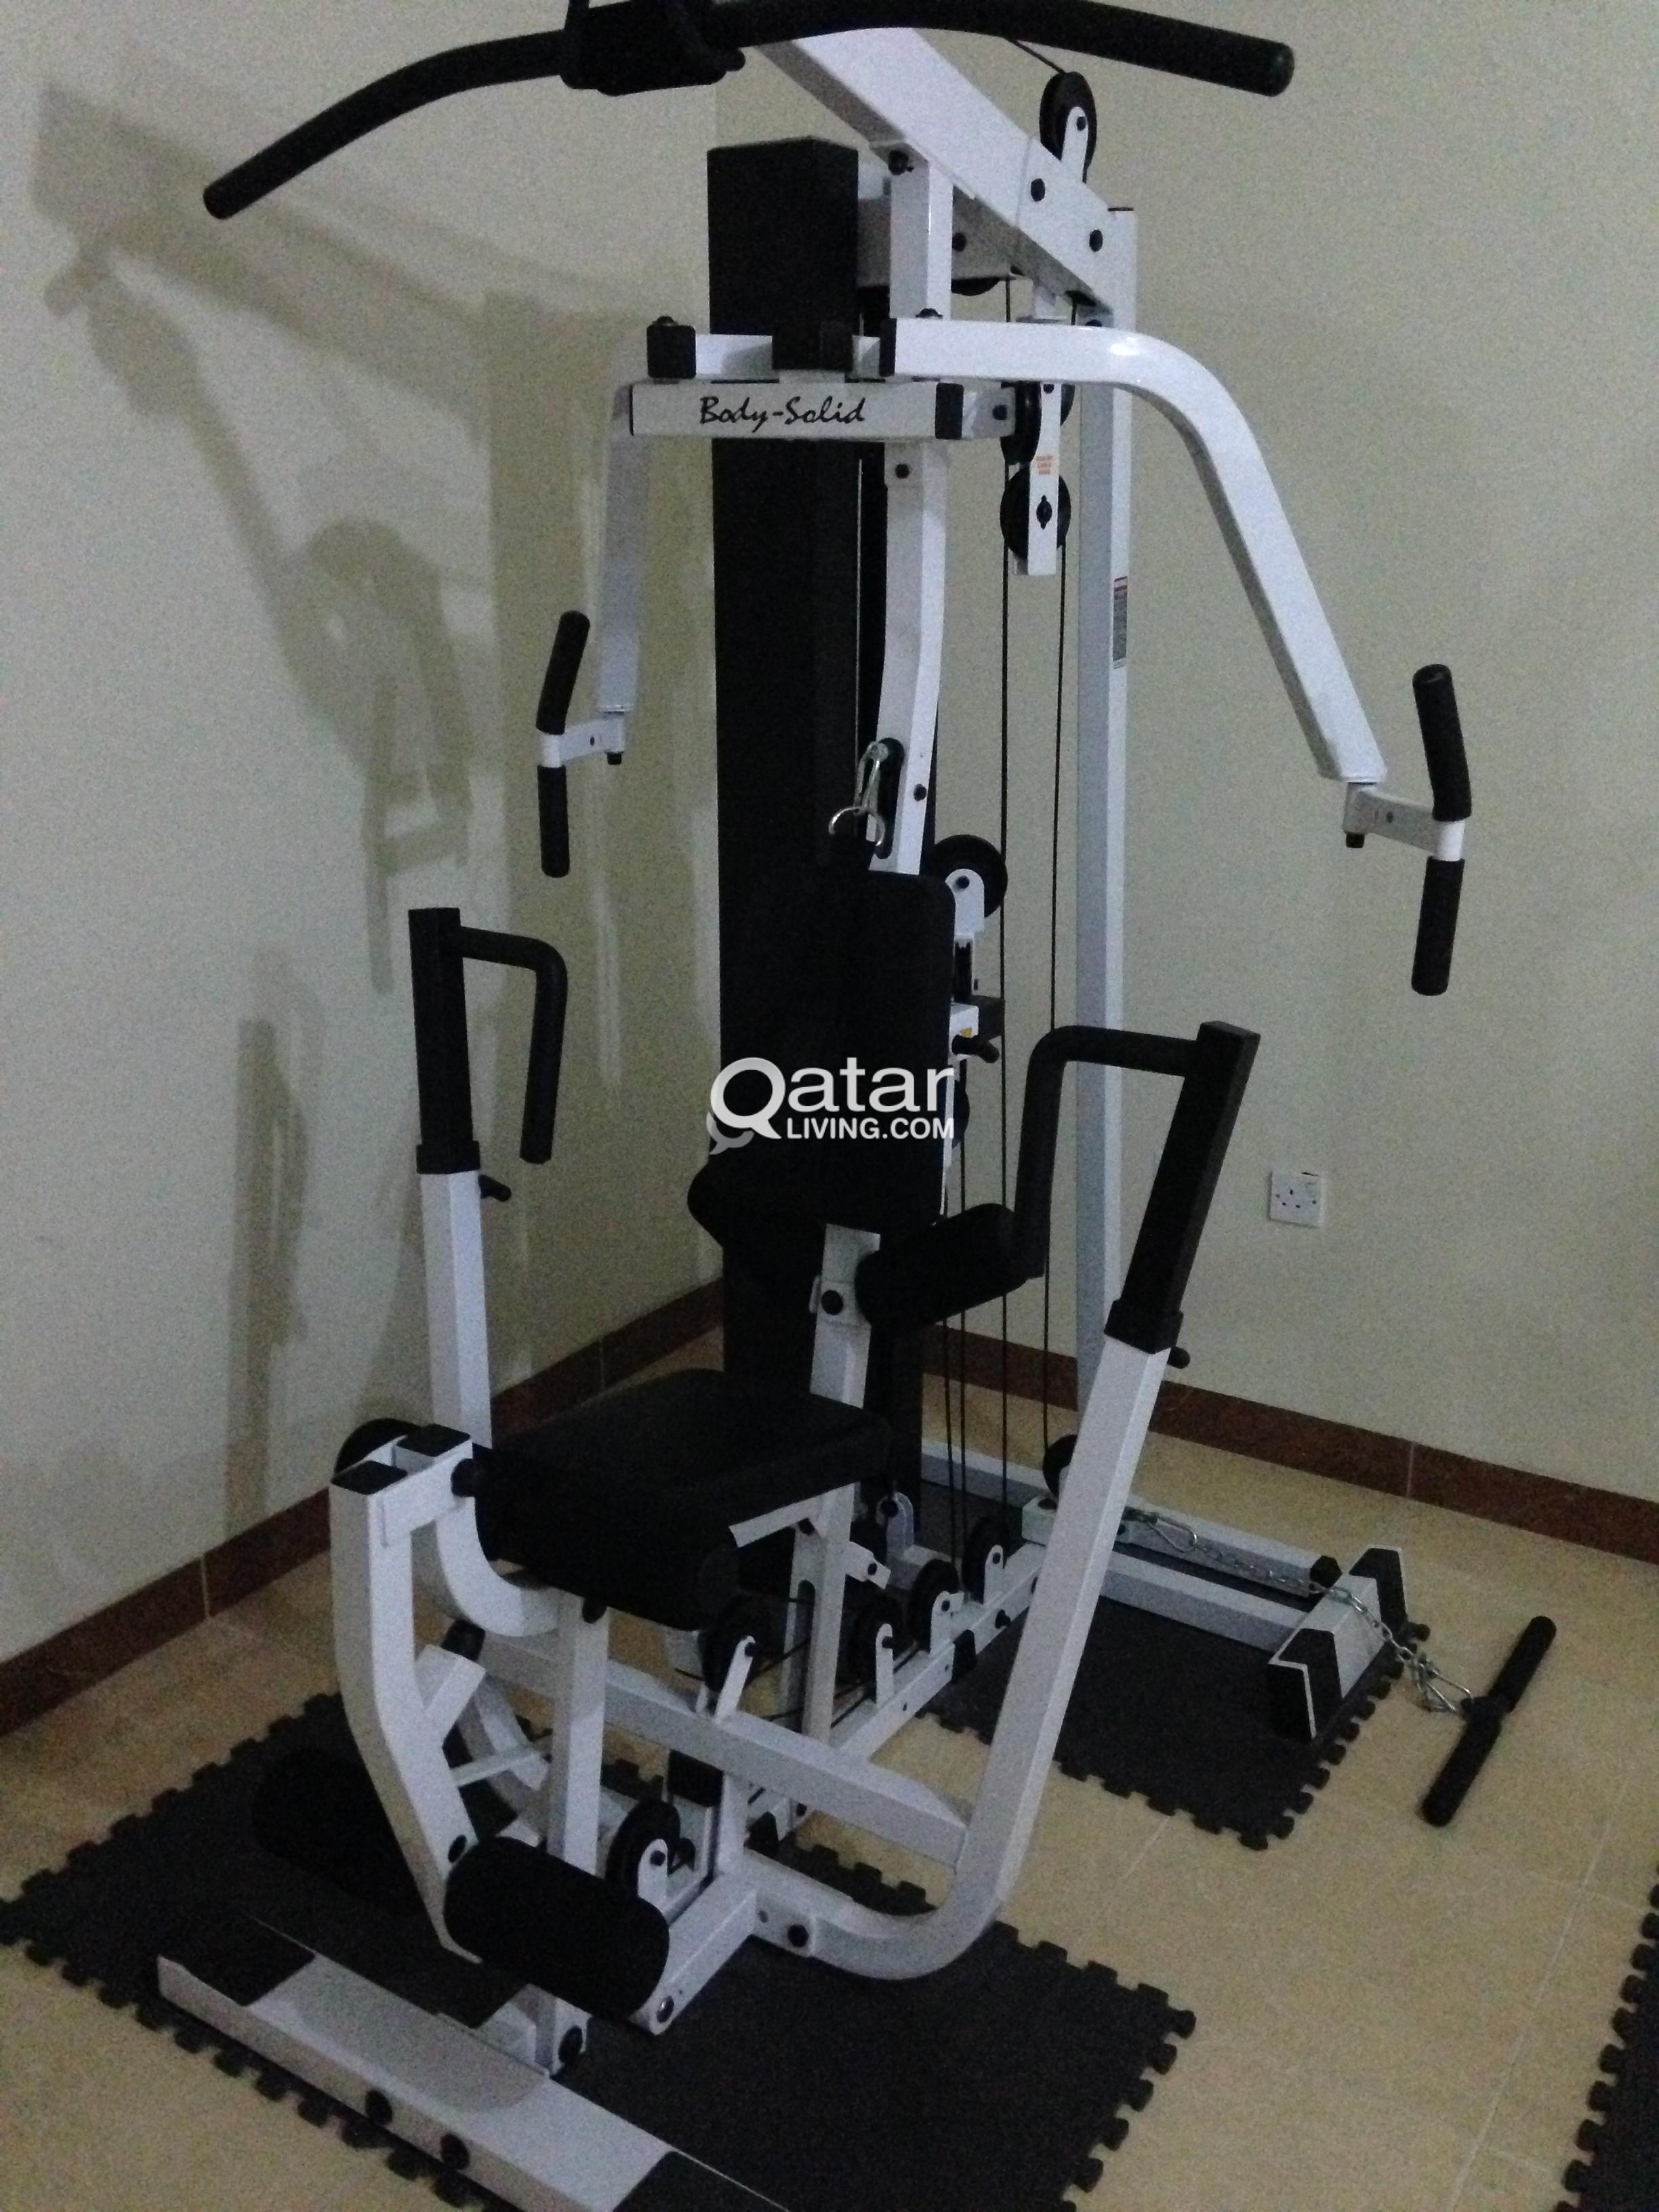 Superb home gym for sale qatar living